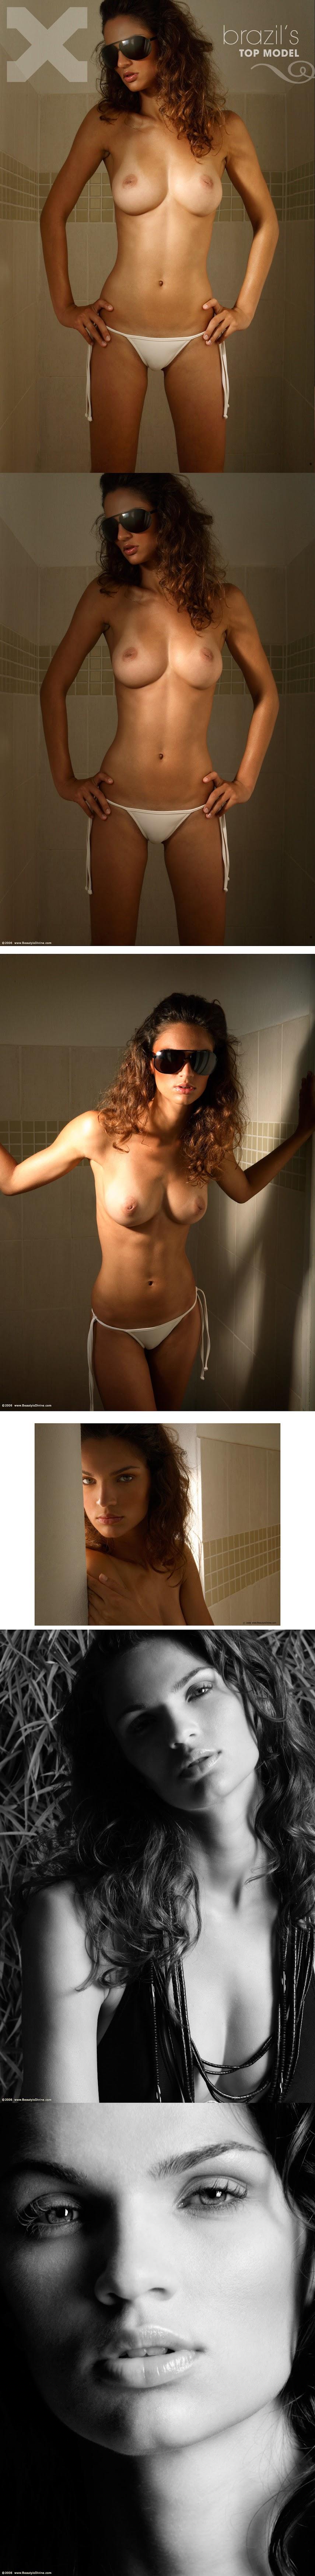 x-art gisele top model from brazil-lrgReal Street Angels